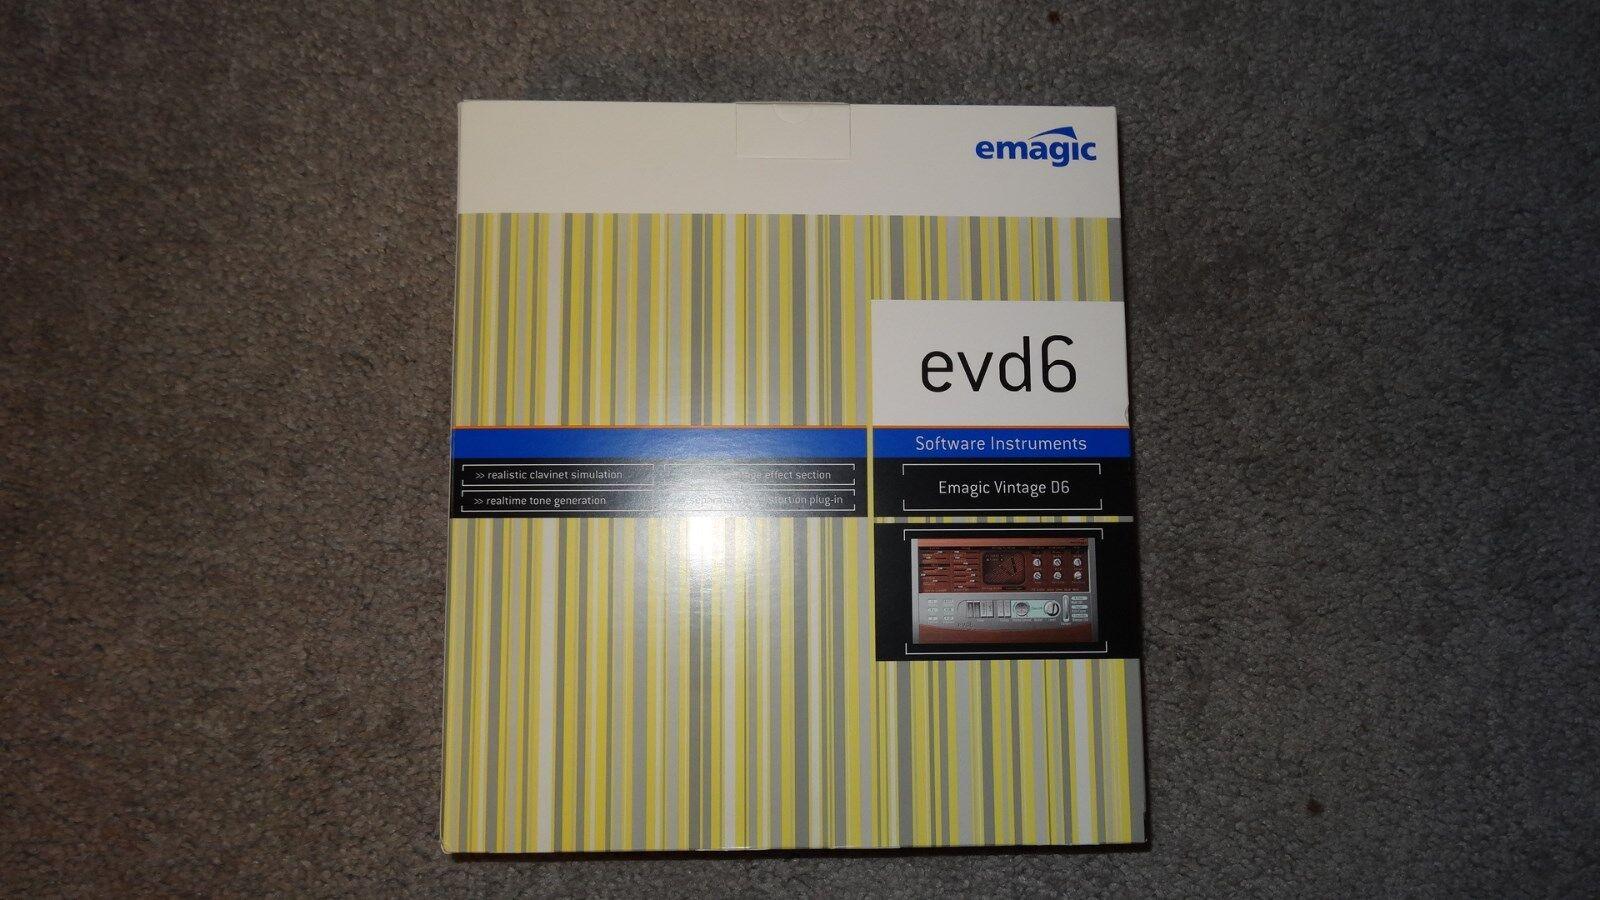 EMAGIC LOGIC 5 EVD6 SOFTWARE INSTRUMENT EMAGIC VINTAGE D6 WIN   MAC